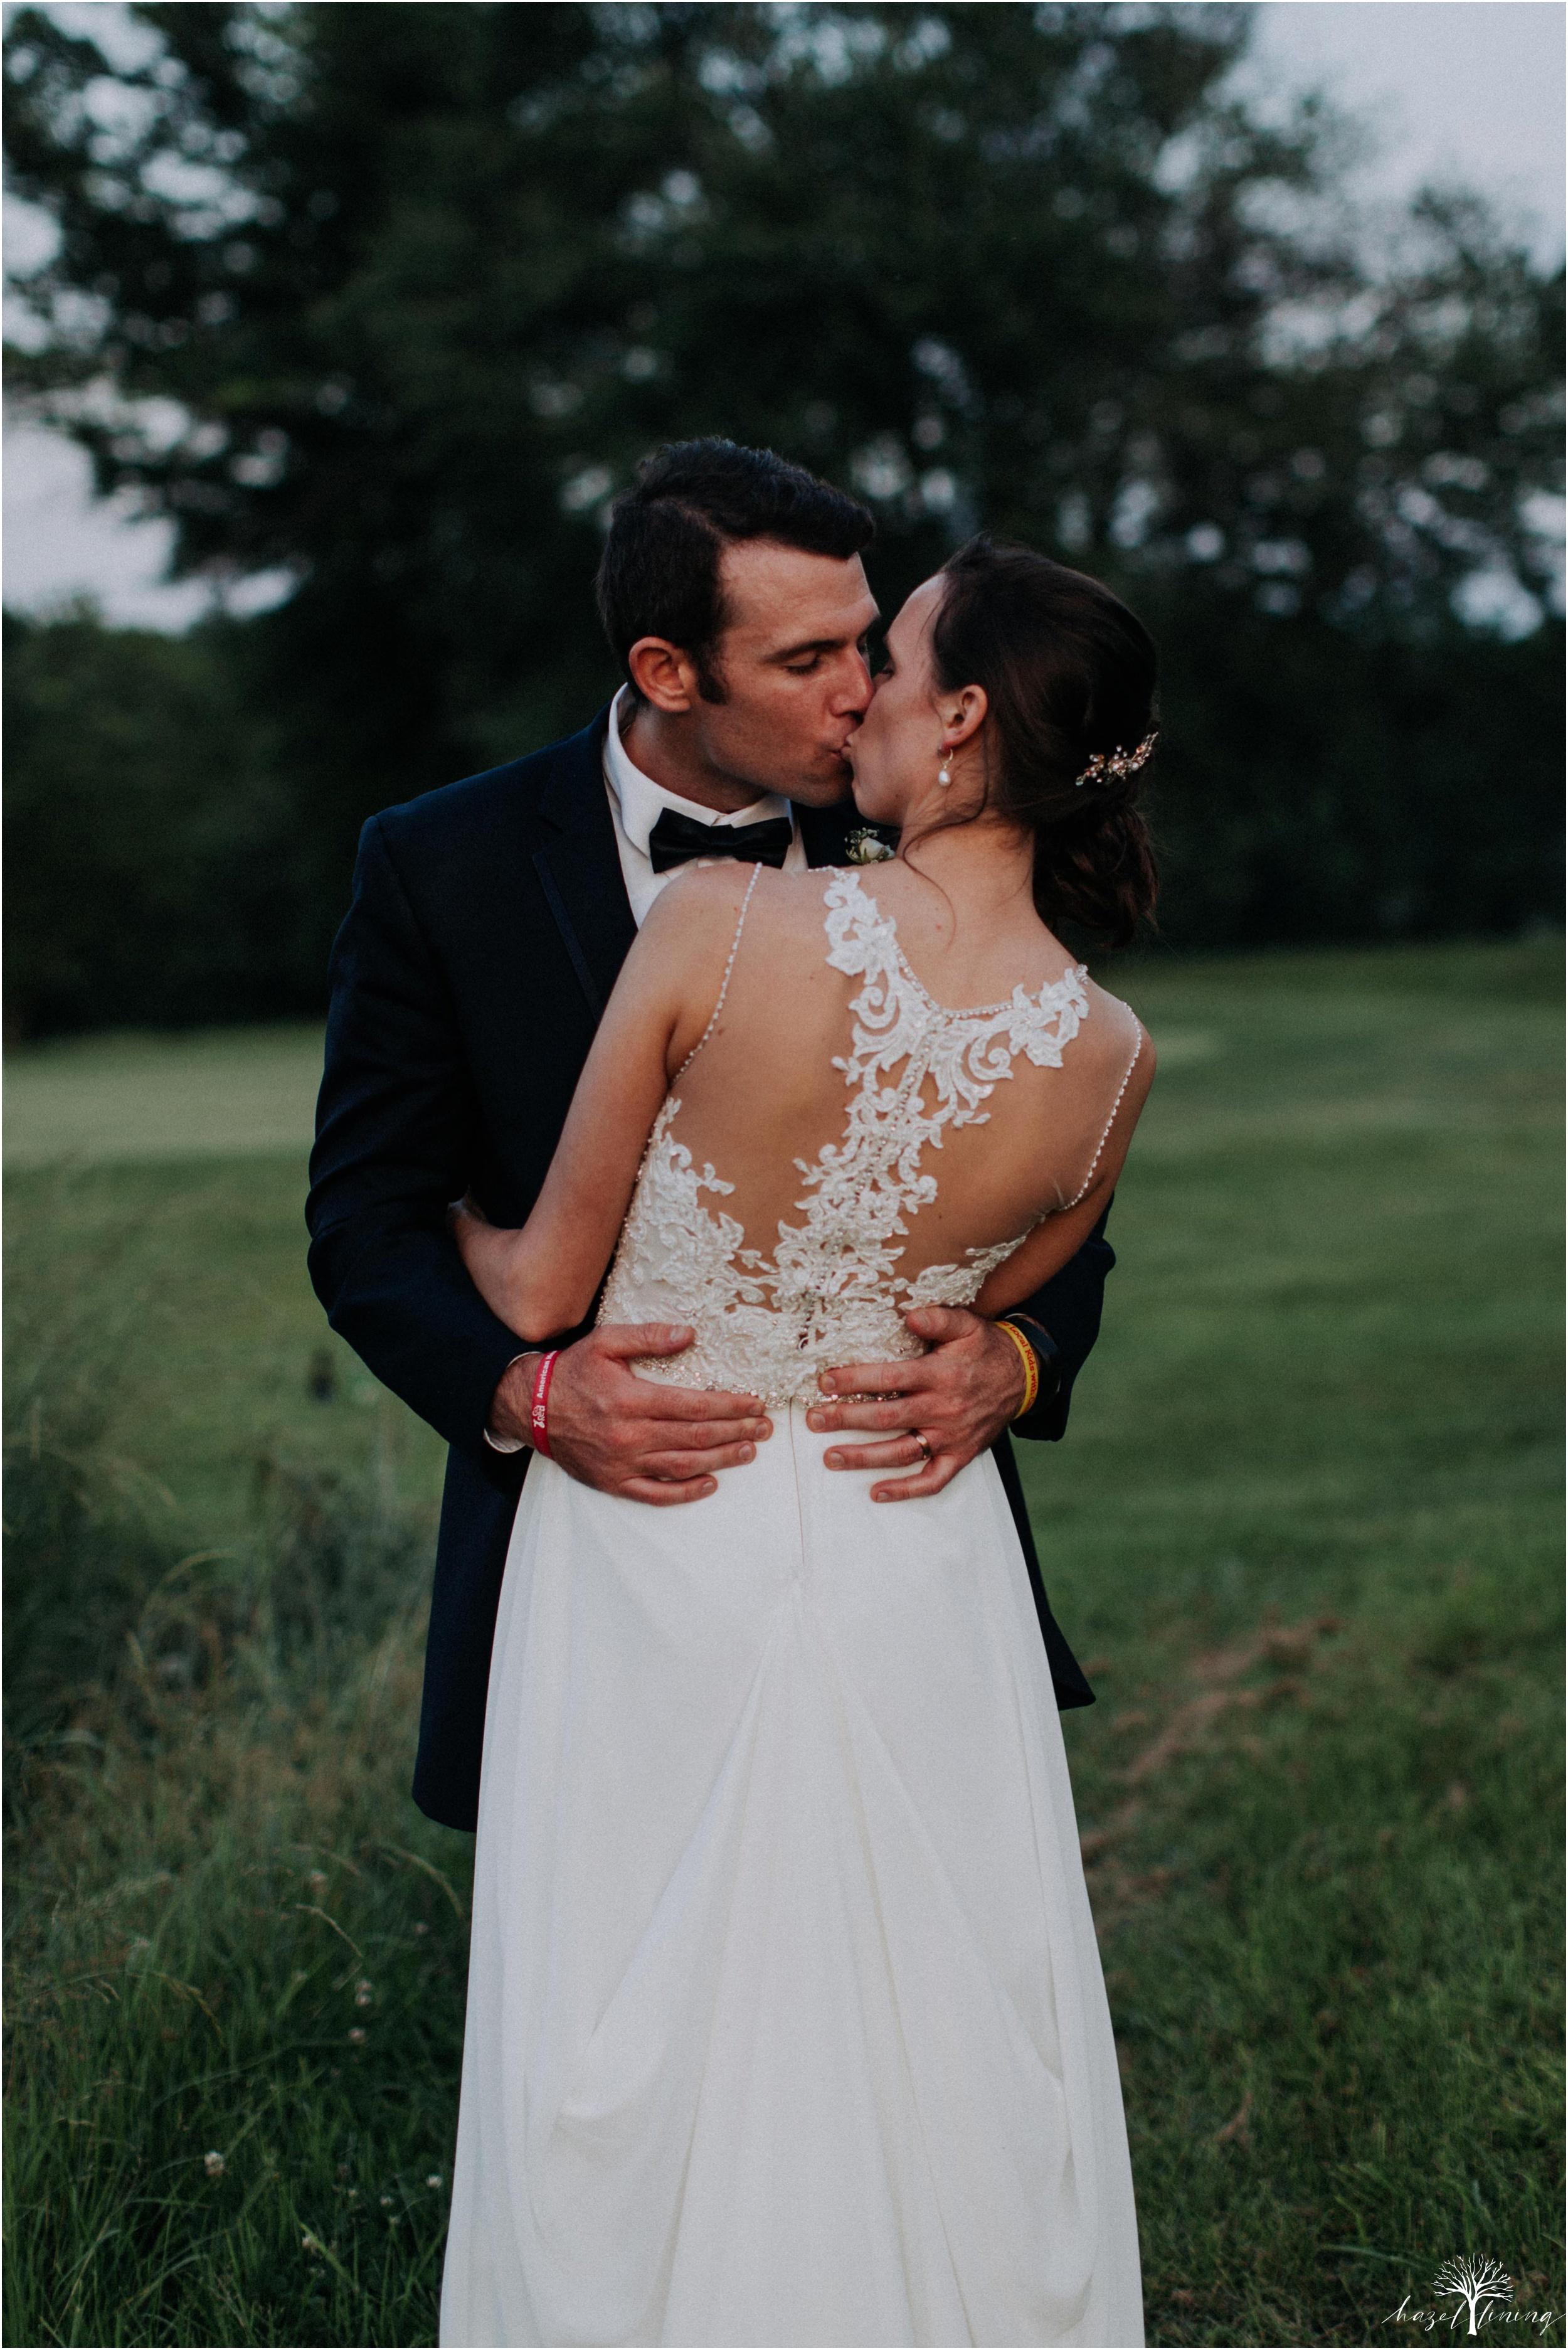 hazel-lining-travel-wedding-elopement-photography_0167.jpg